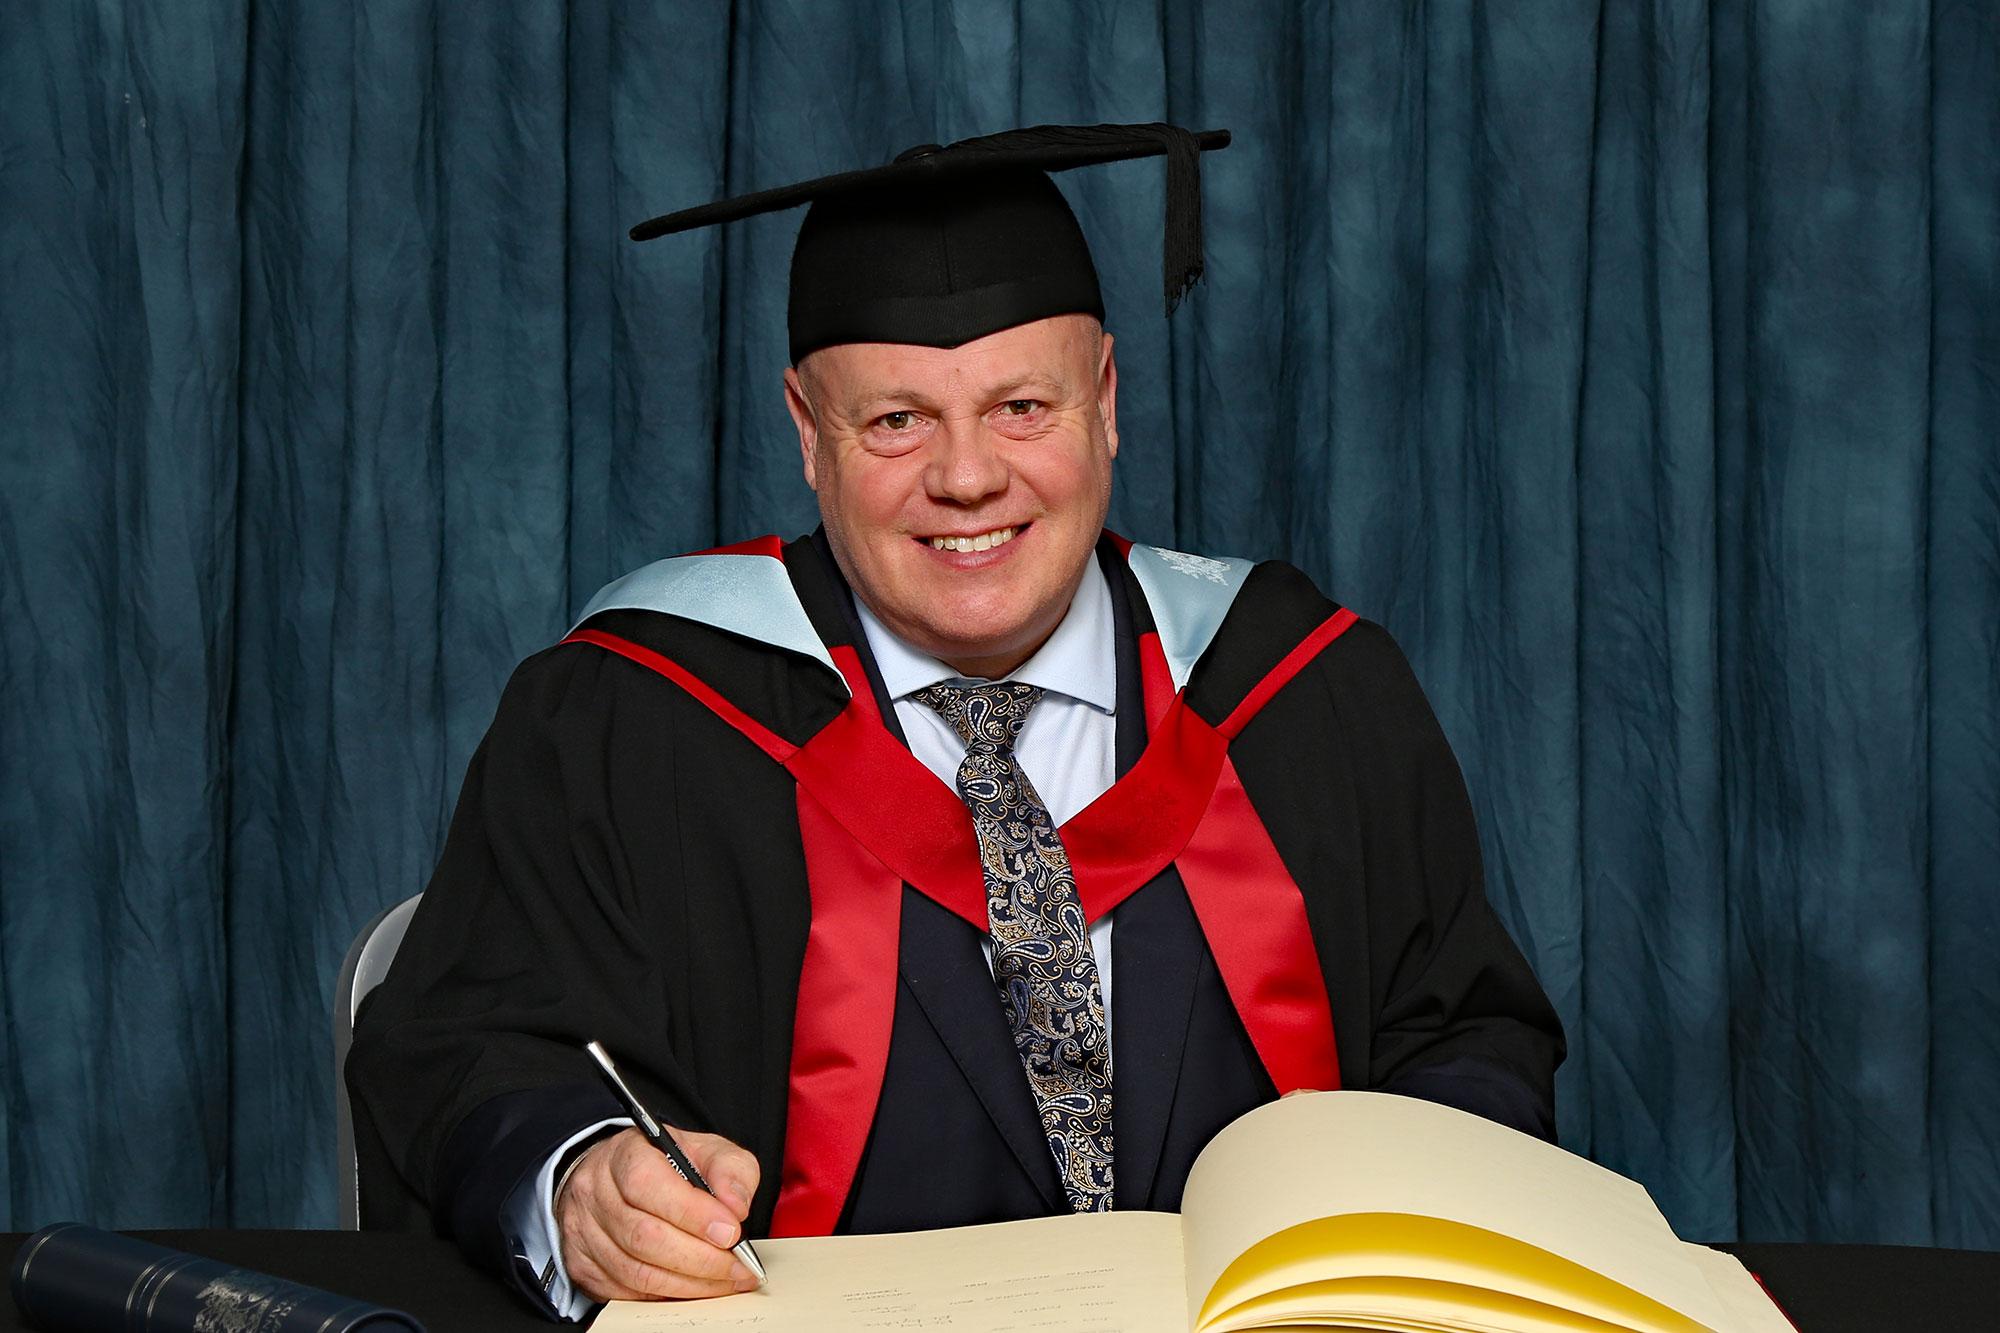 Mervyn Allcock MBE receiving his honorary degree, HonMUniv, November 2019